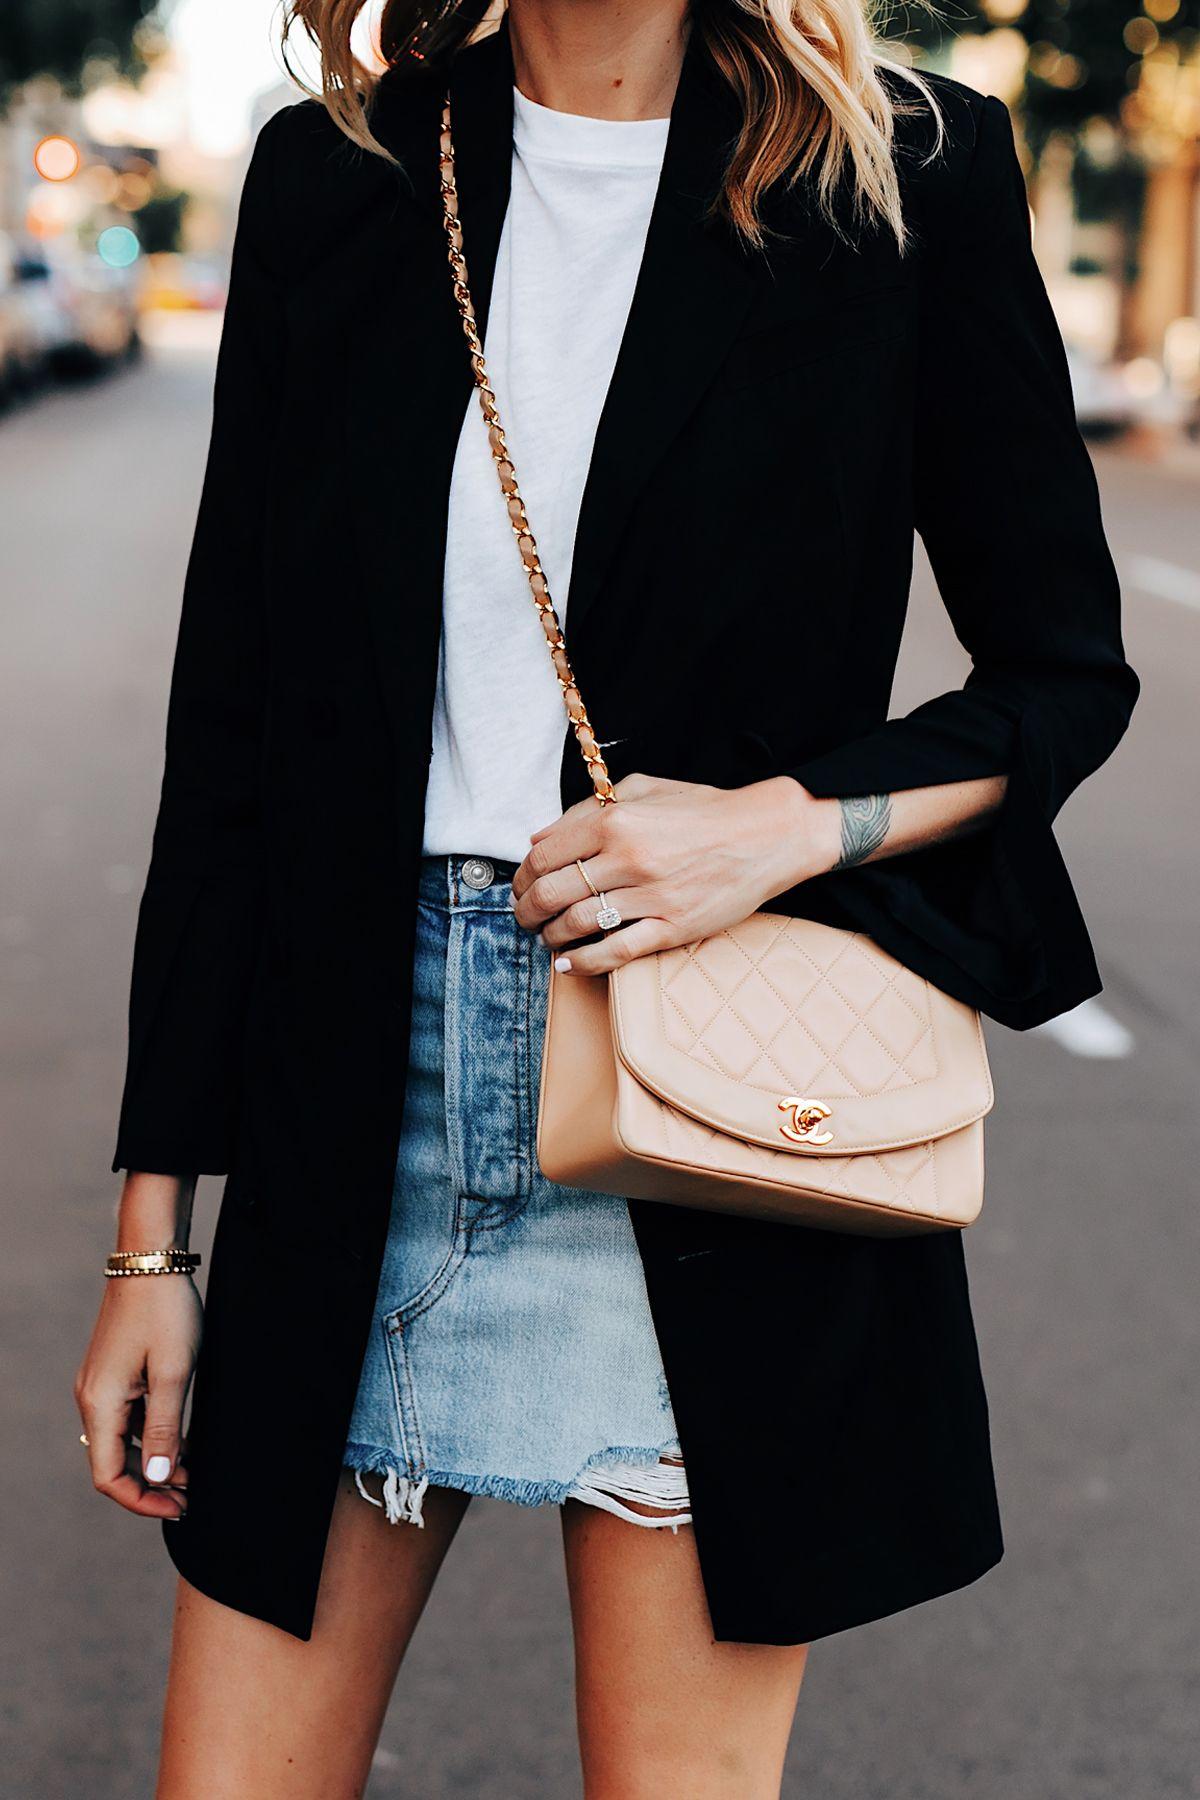 Fashion Jackson Wearing Anine Bing Black Blazer White Tshirt Levis Denim Skirt Chanel Beige Handbag 2